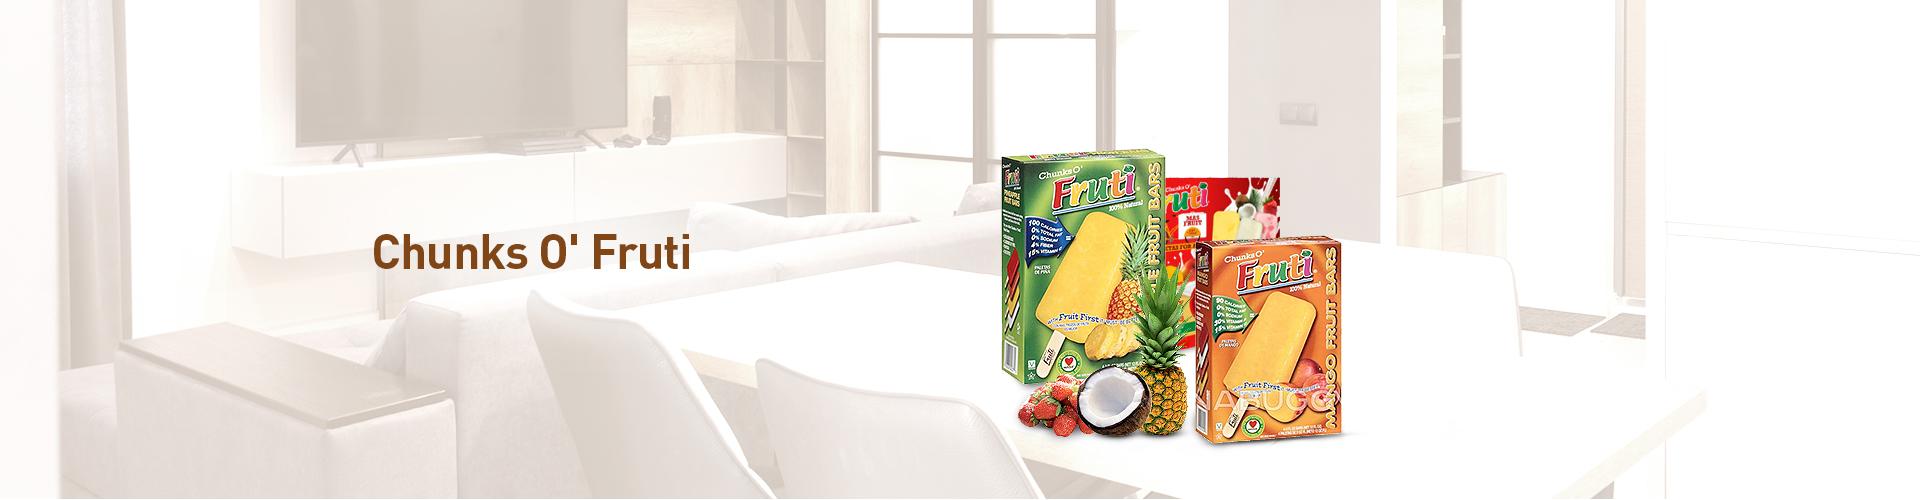 Chunks O Fruti